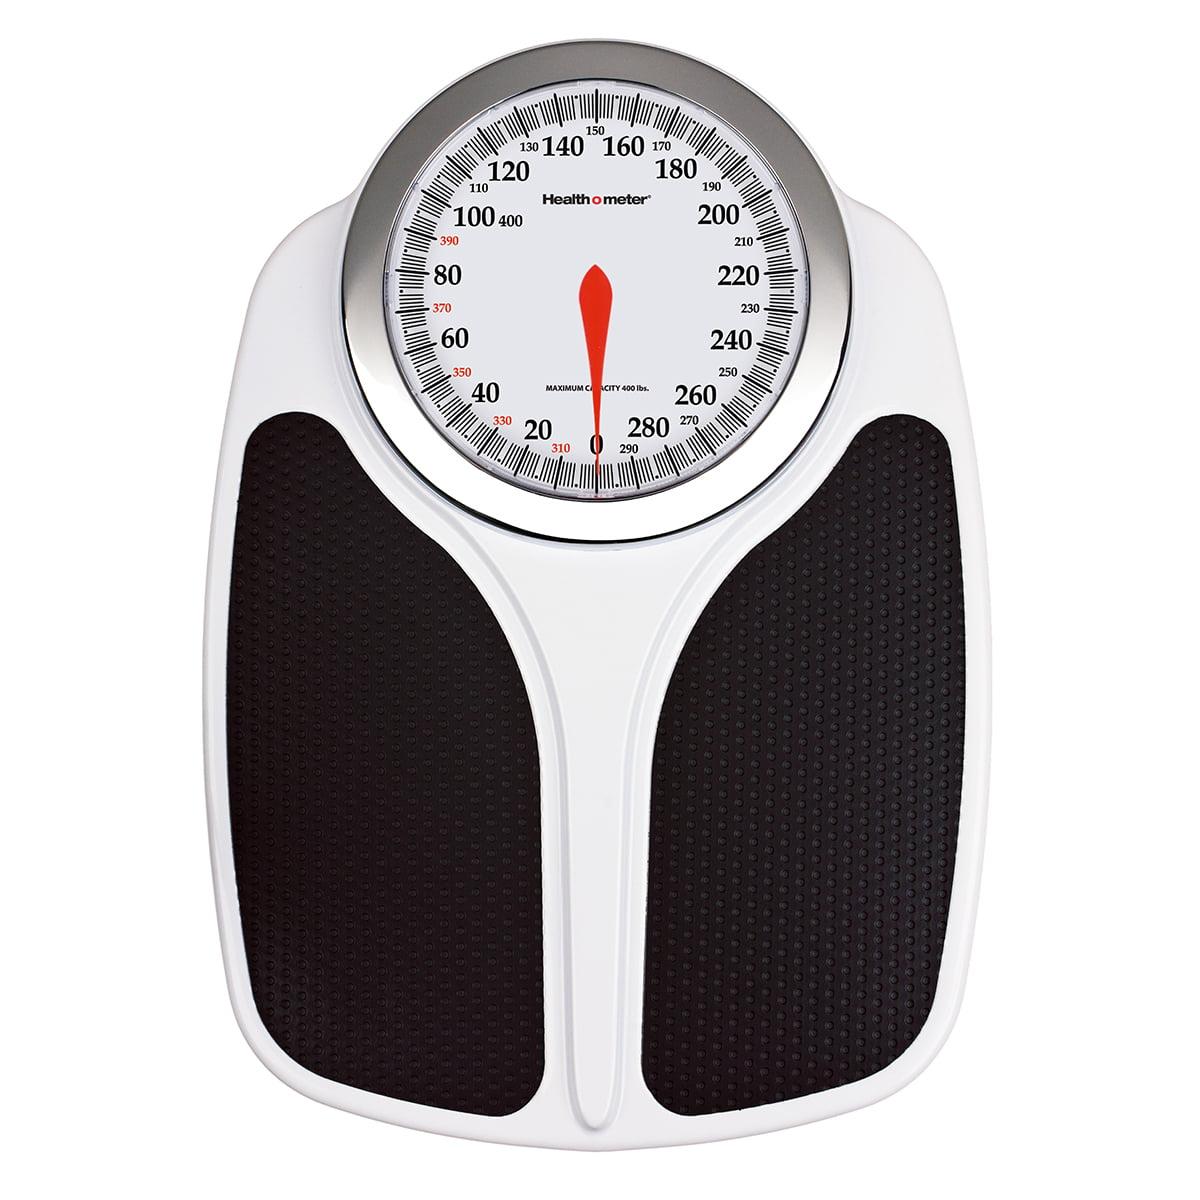 Health O Meter Dial Bathroom Scale (145KD-41) - Walmart ...